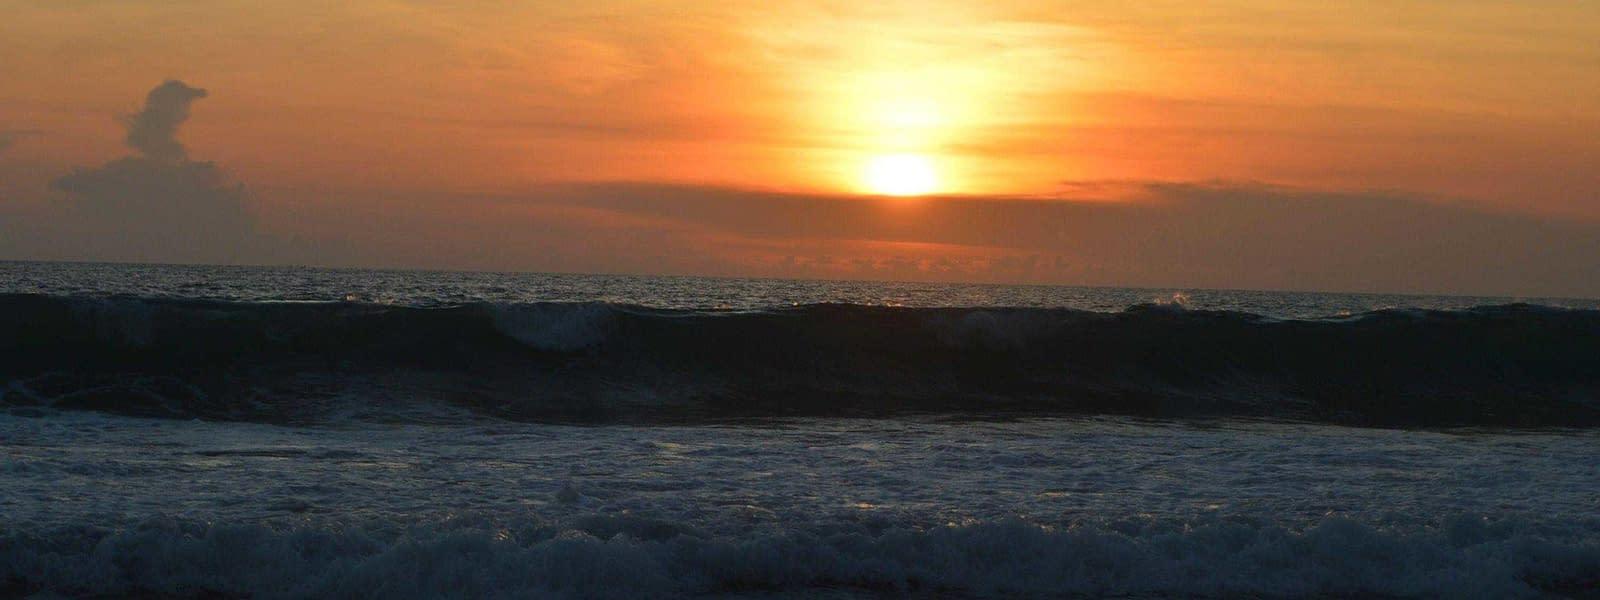 Karen Beach Sunset - Best Phuket Beaches